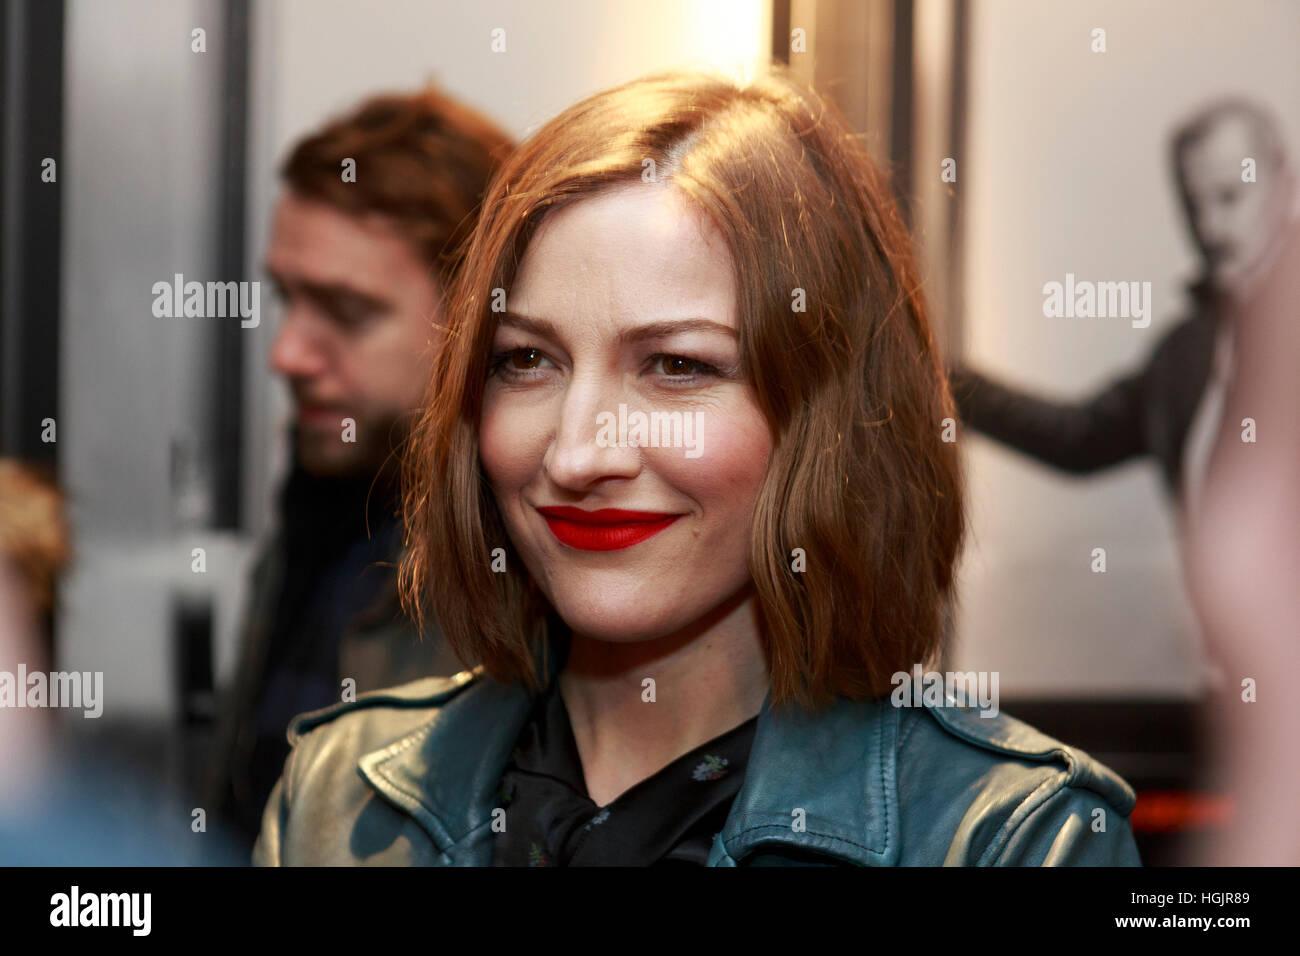 Edinburgh, UK. 22. Januar 2017. T2 Trainspotting Premiere beim Edinburgh Cineworld. Schottland. Abgebildete Kelly Stockbild